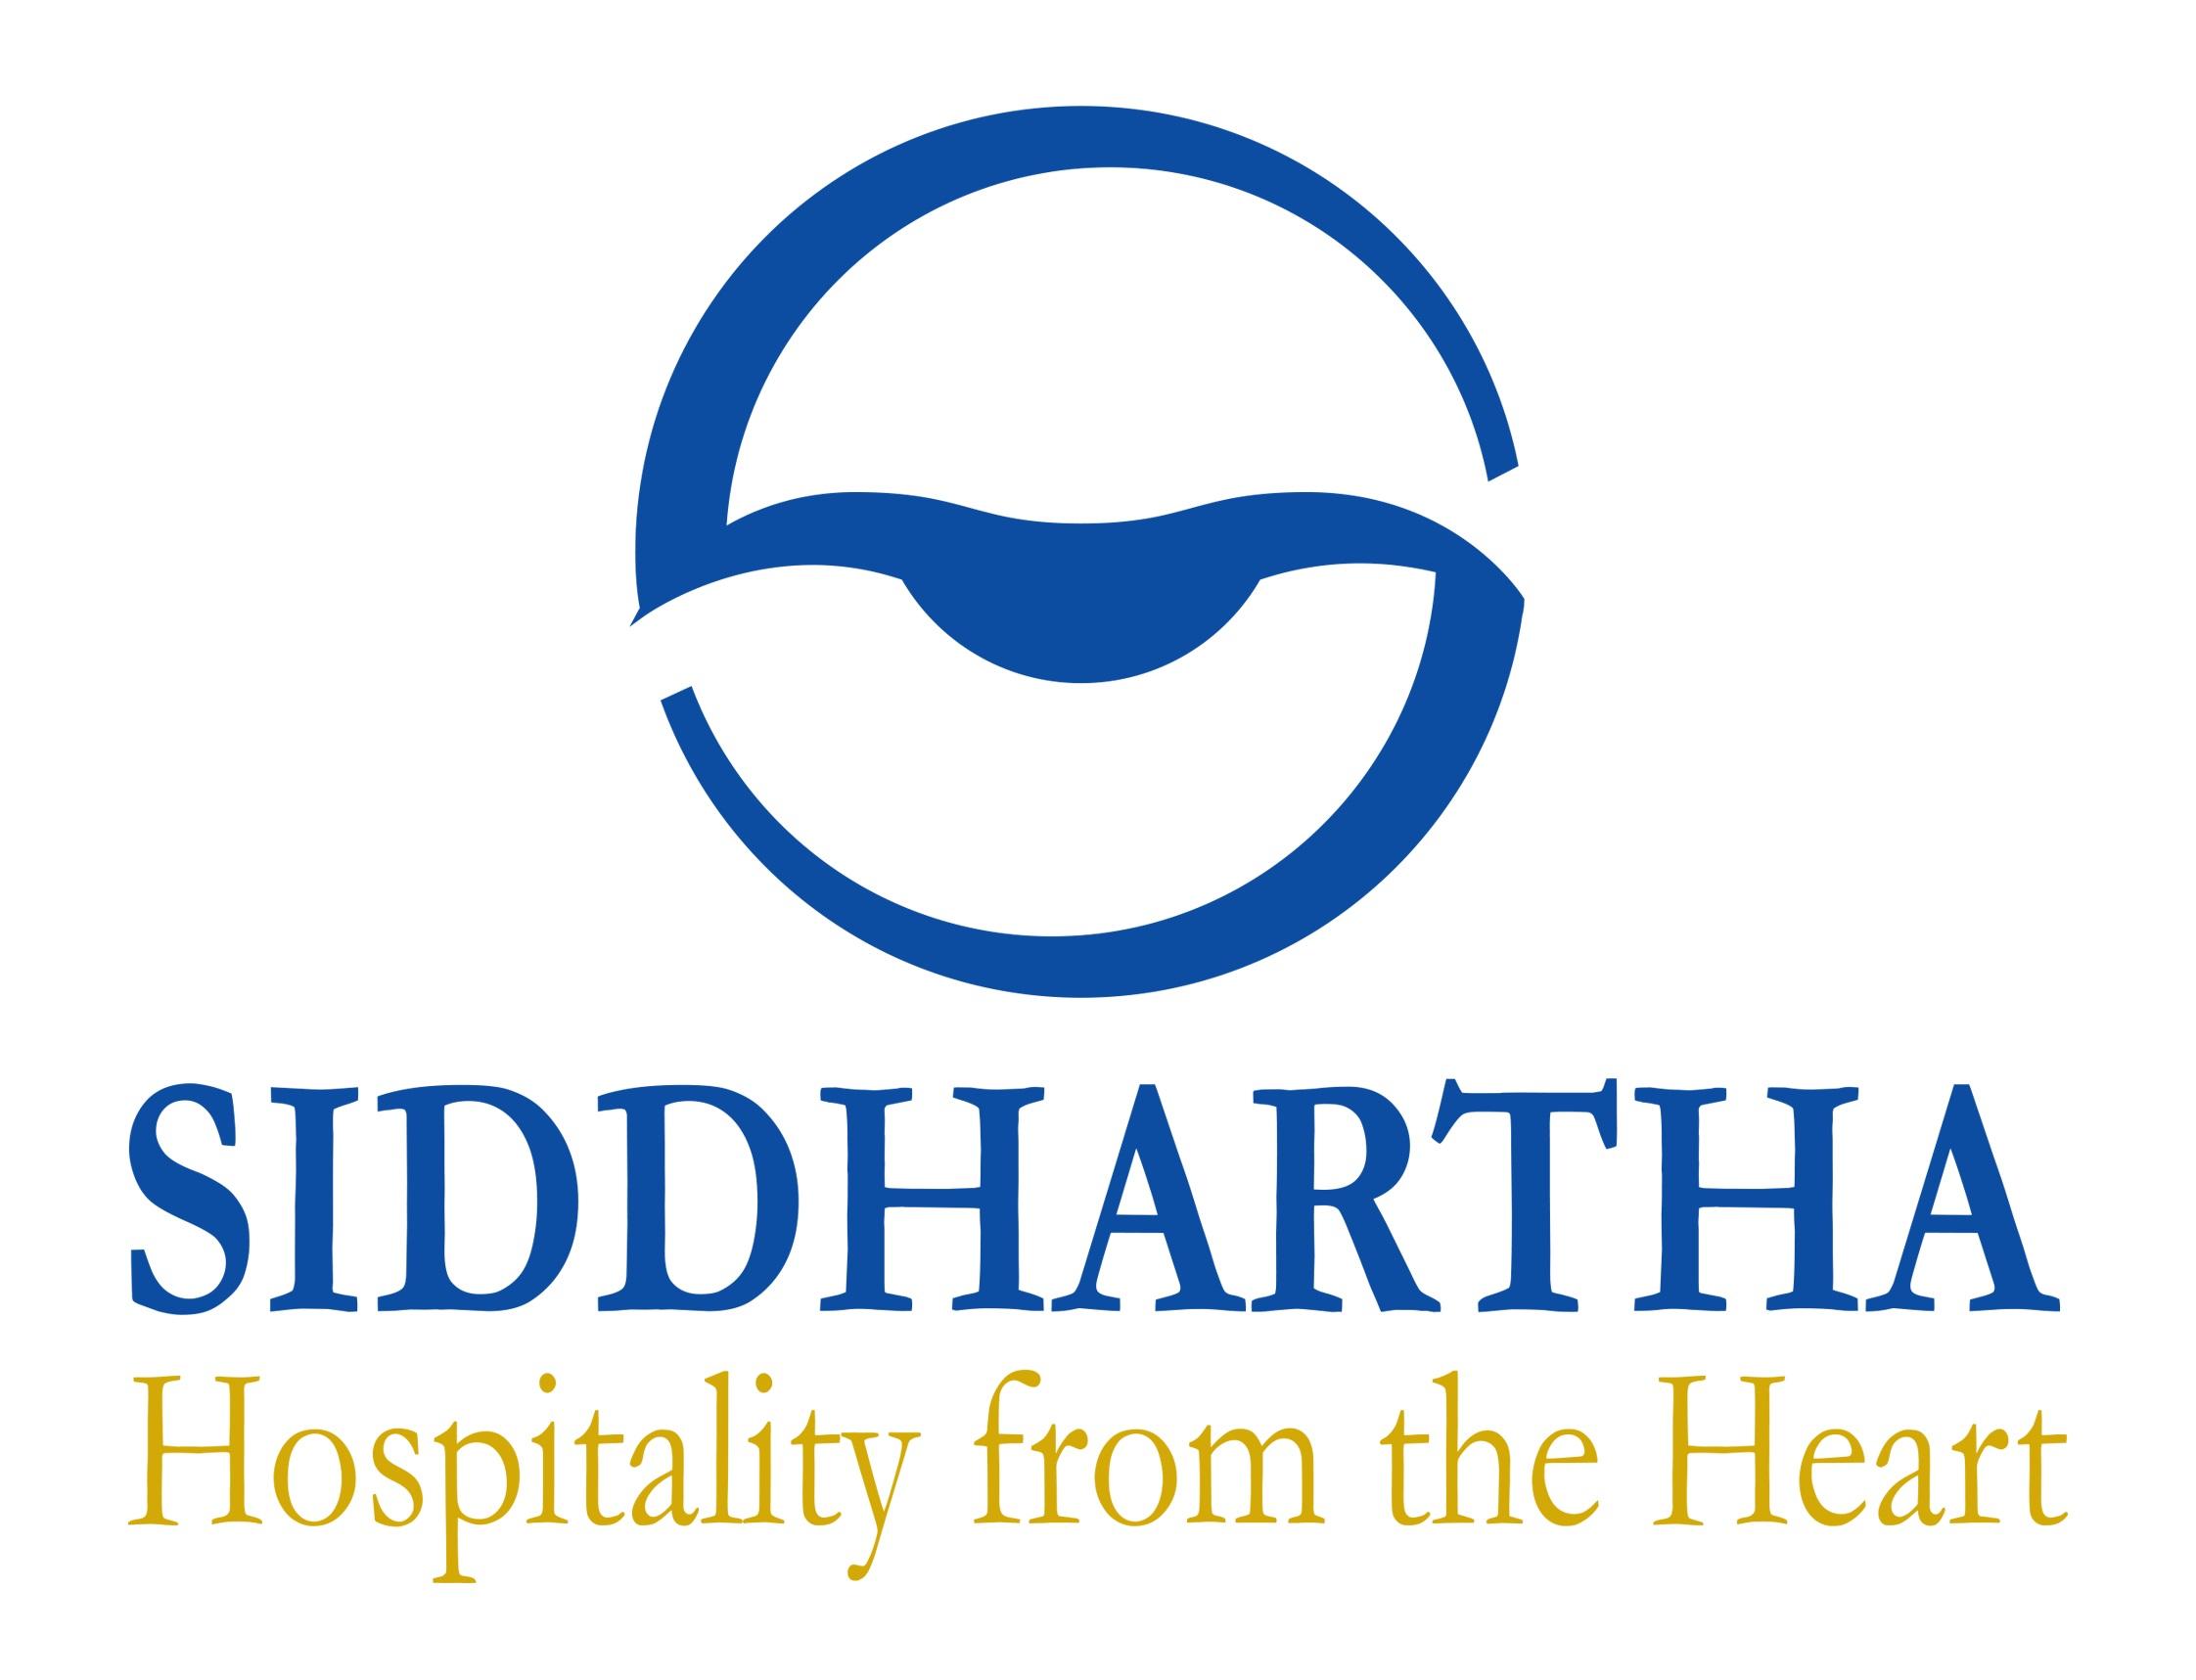 Prabhakar Khadka, Siddhartha Business Group of Hospitality, Nepal